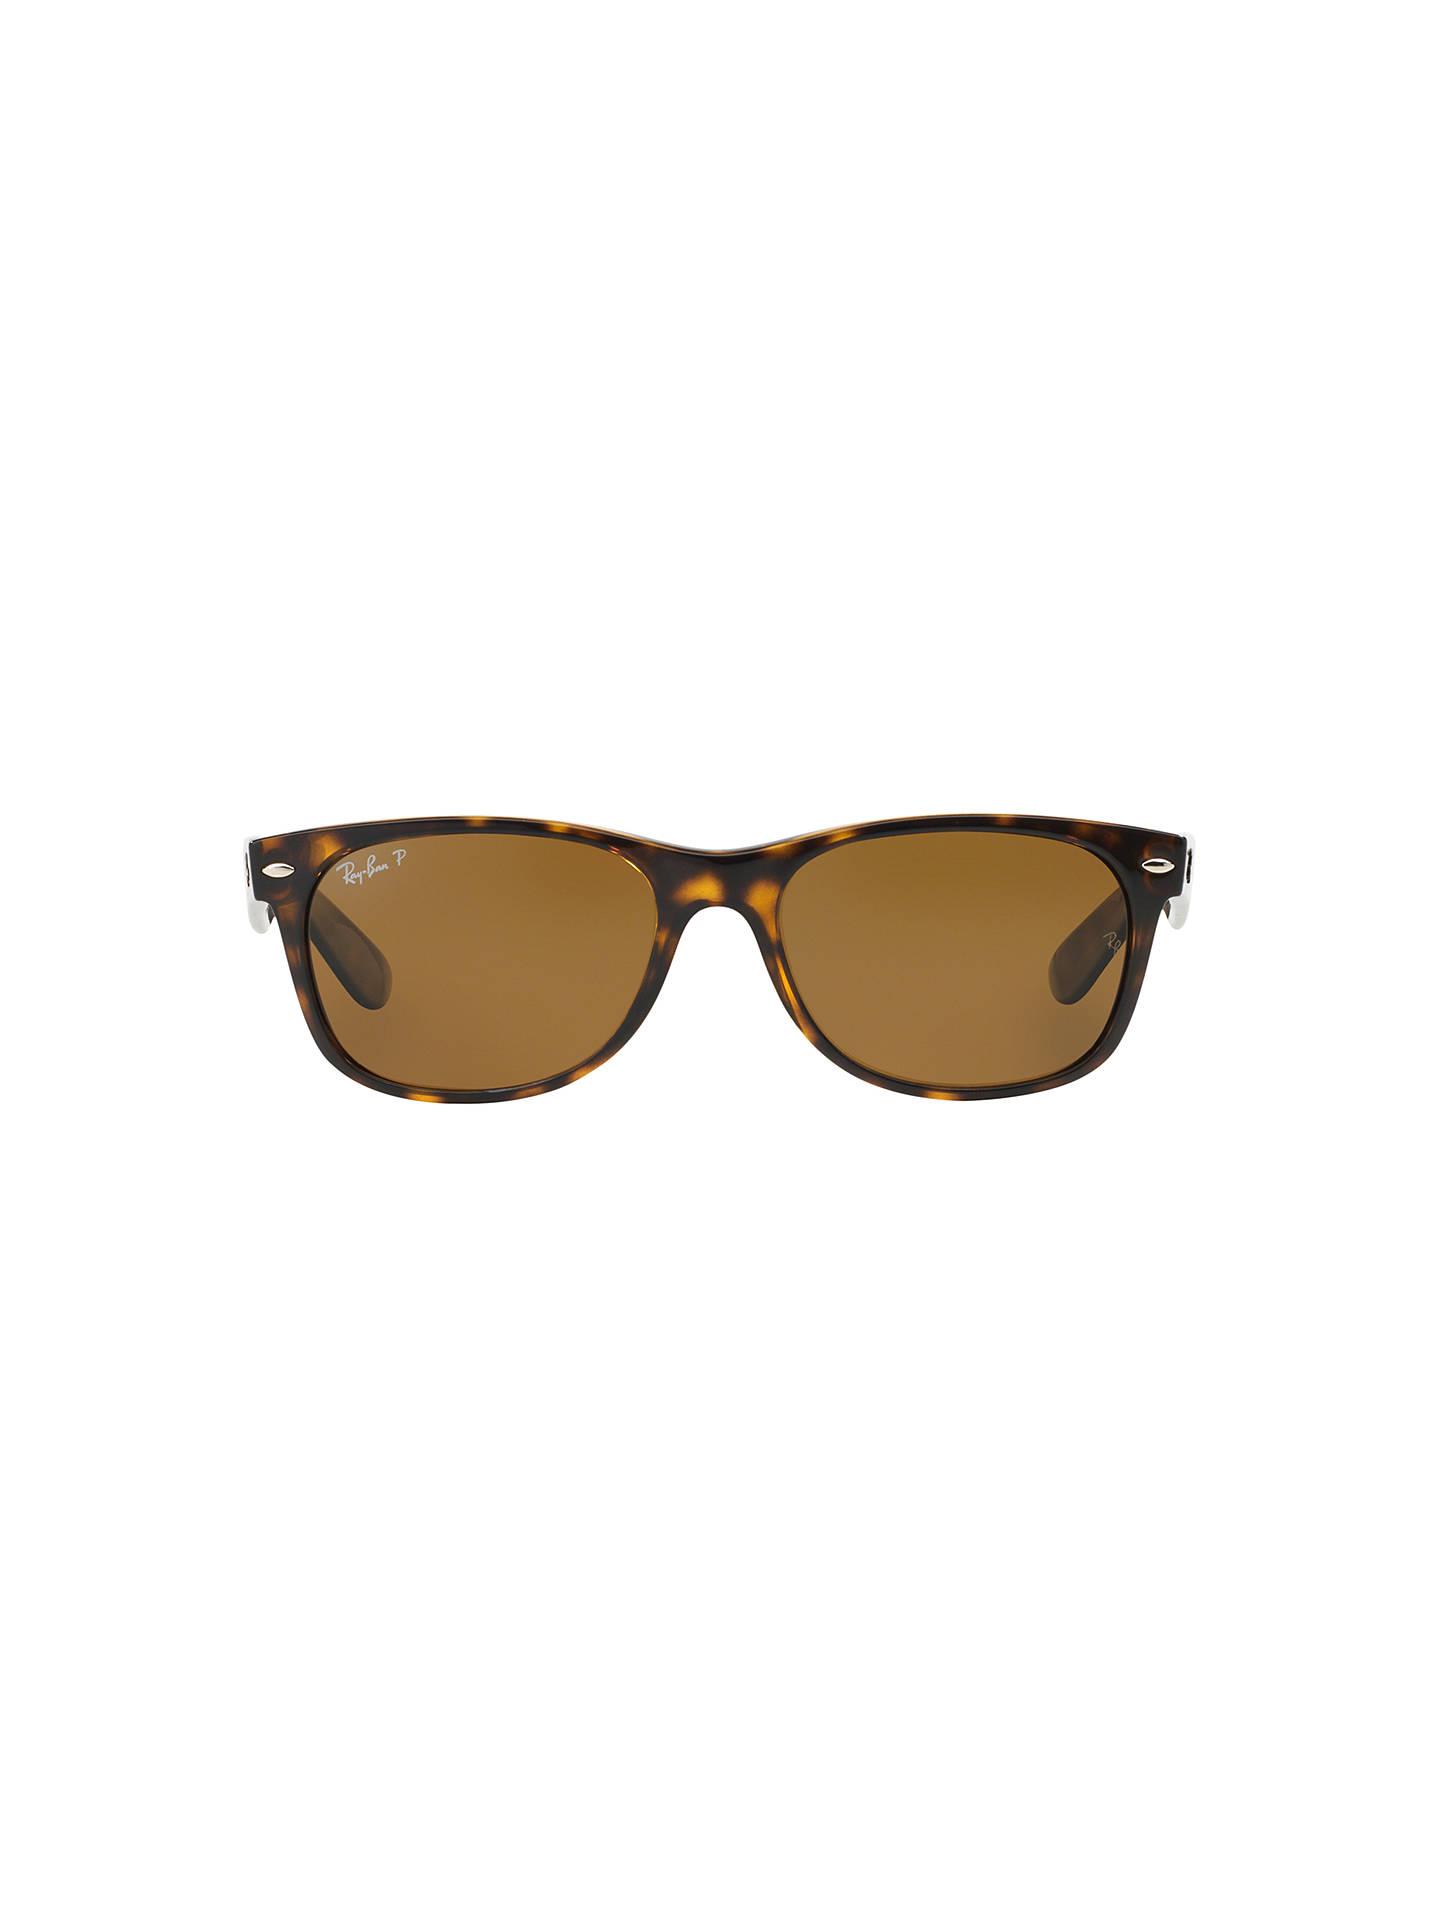 e6806da266 ... BuyRay-Ban RB2132 New Wayfarer Polarised Sunglasses